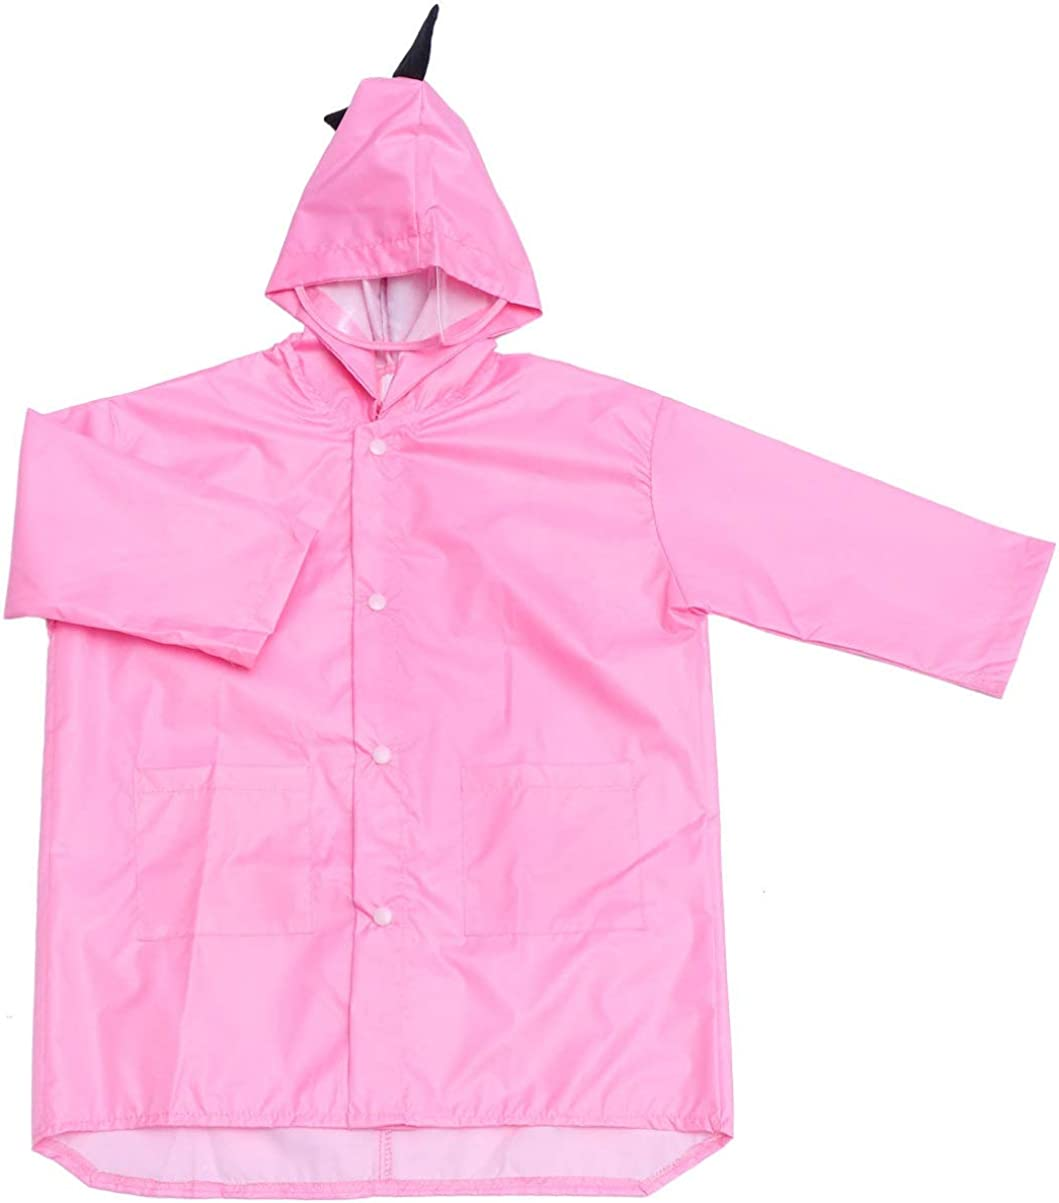 Wakauto Kids Raincoat Boys Waterproof 6-12,Unisex Kids Storm Break Waterproof Jacket,Boys Girls Rain Poncho Hooded Kids Waterproof Raincoat Breathable Raincoat